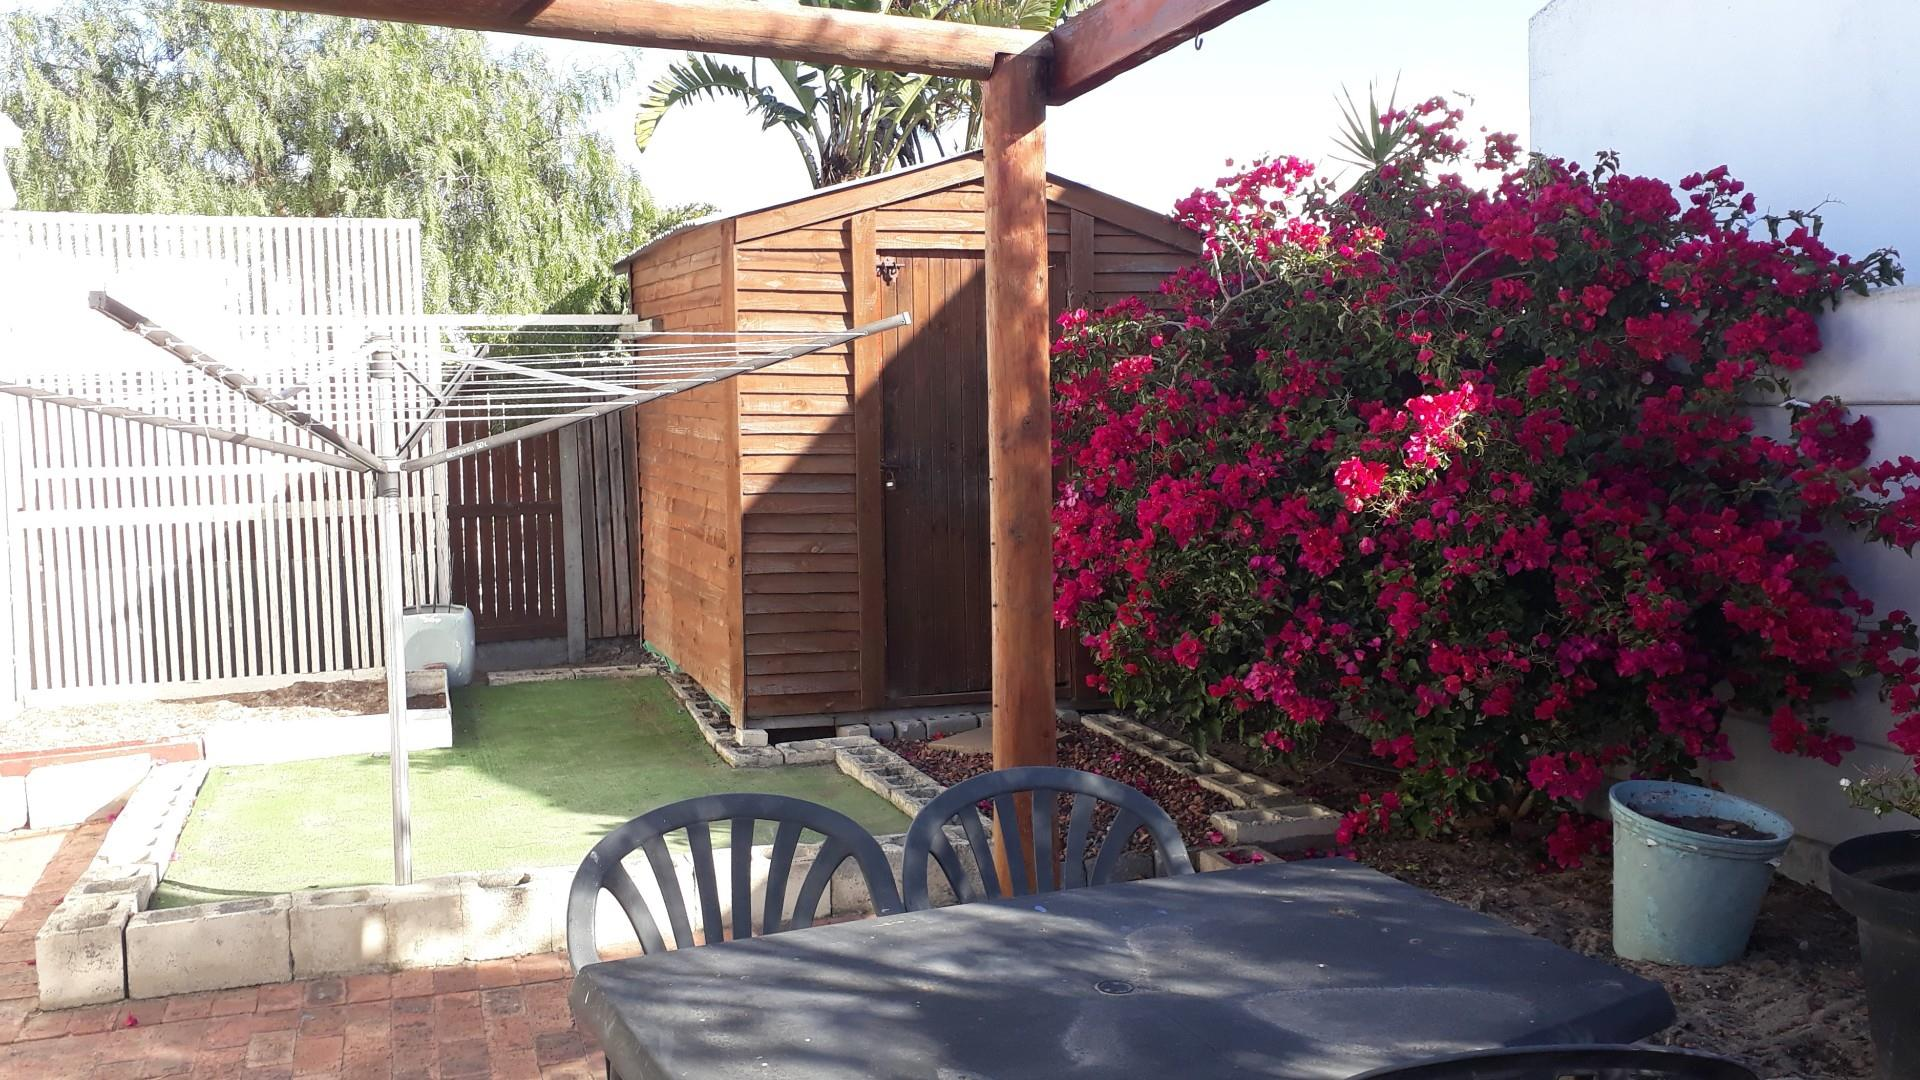 2 Bedroom House For Sale in Marina Da Gama